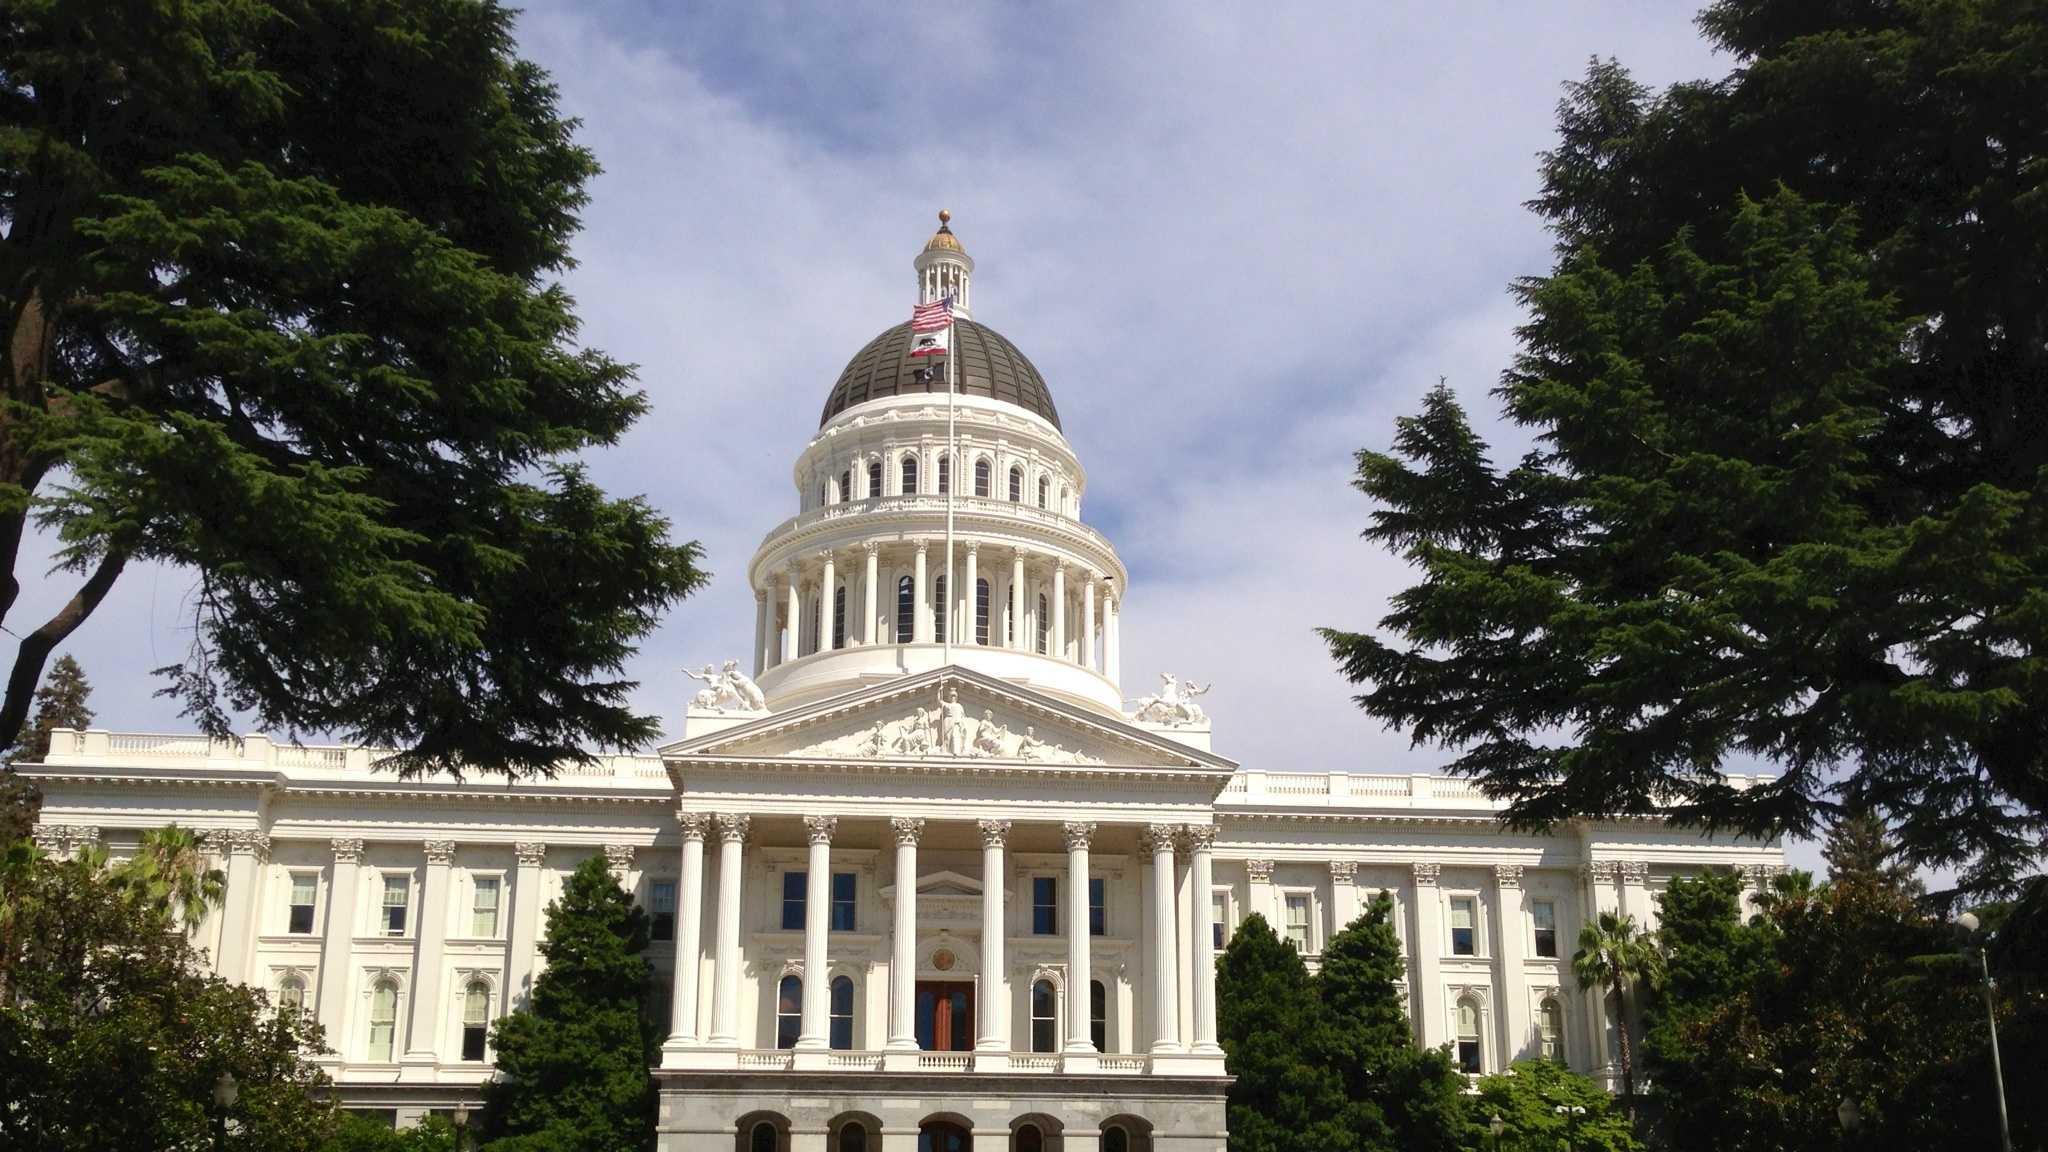 California State Capitol (June 11, 2013)